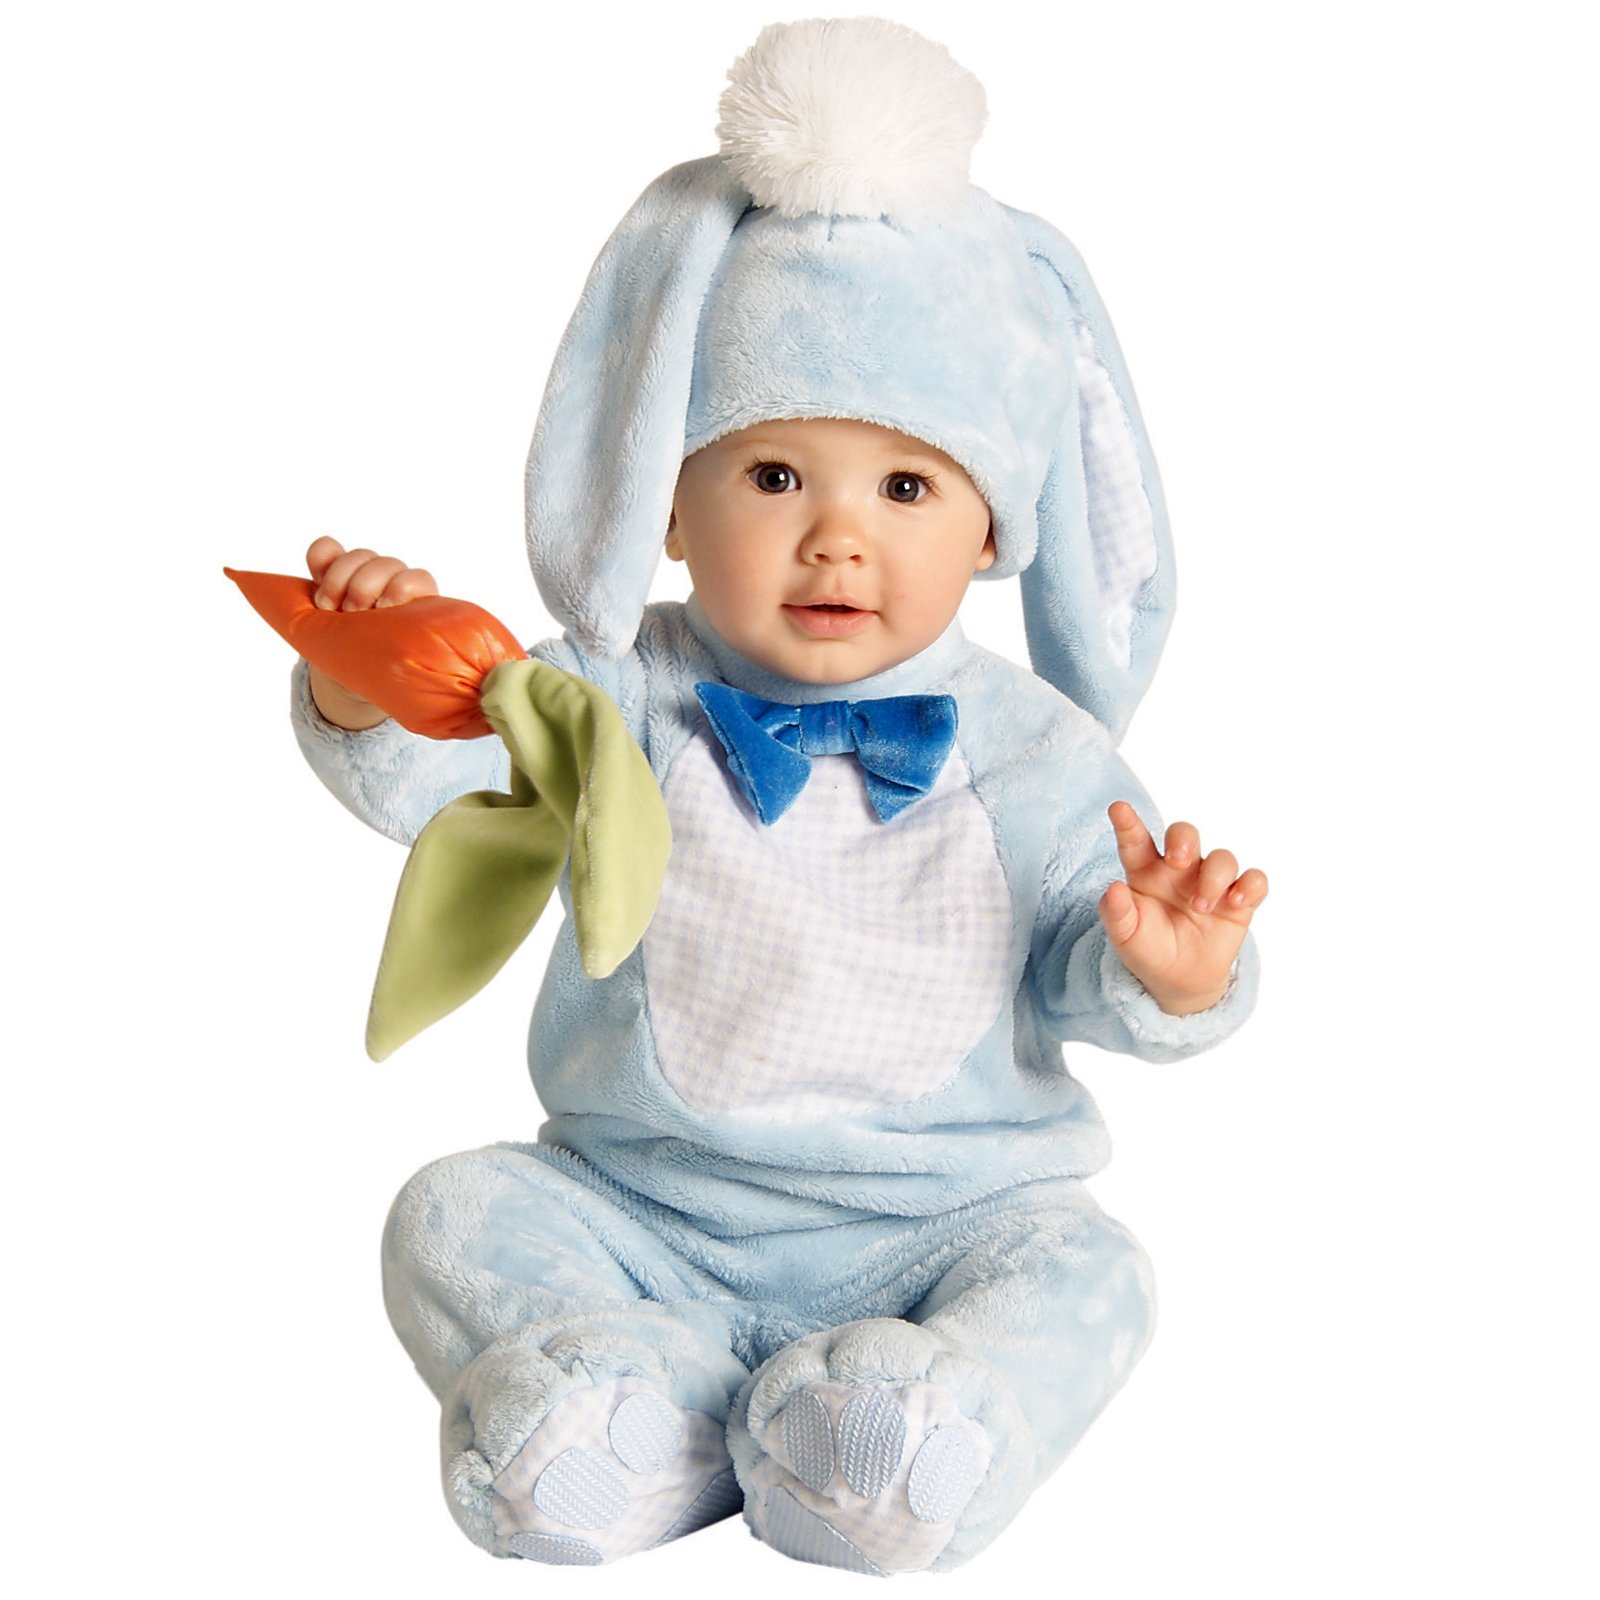 Новогодний костюм новорожденному своими руками